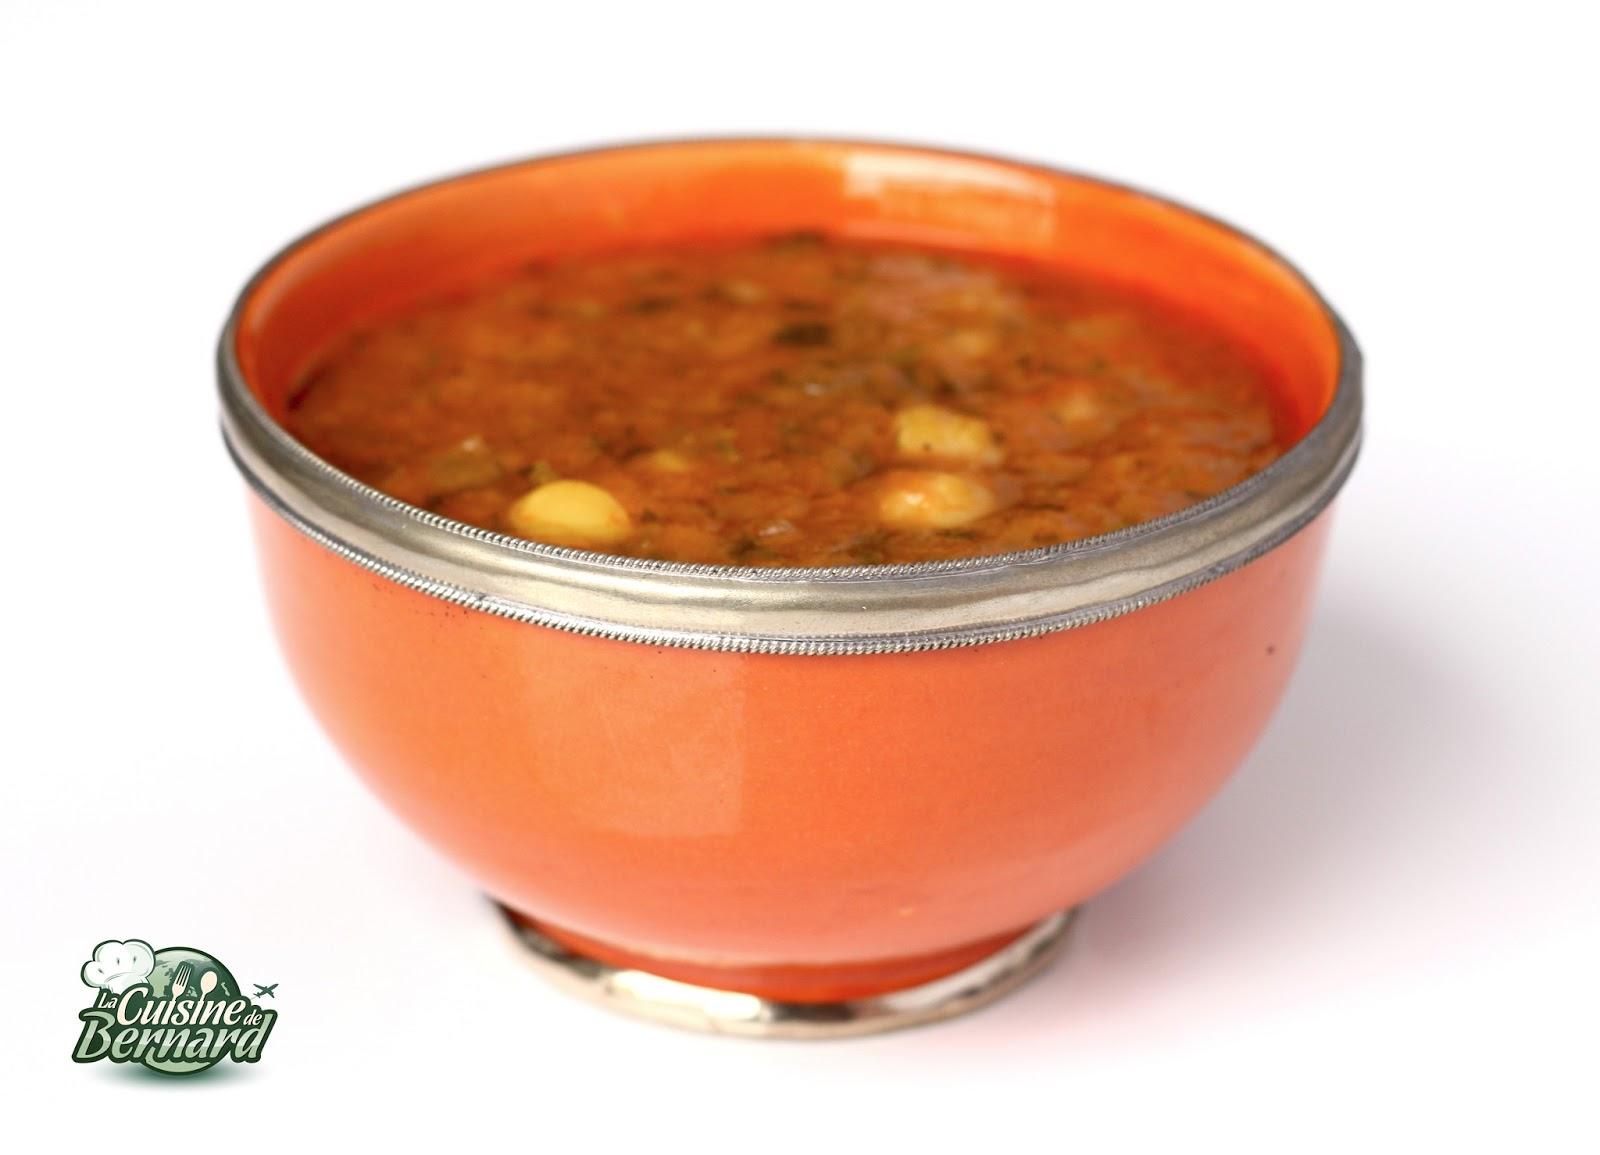 La cuisine de bernard harira for A cuisine de bernard